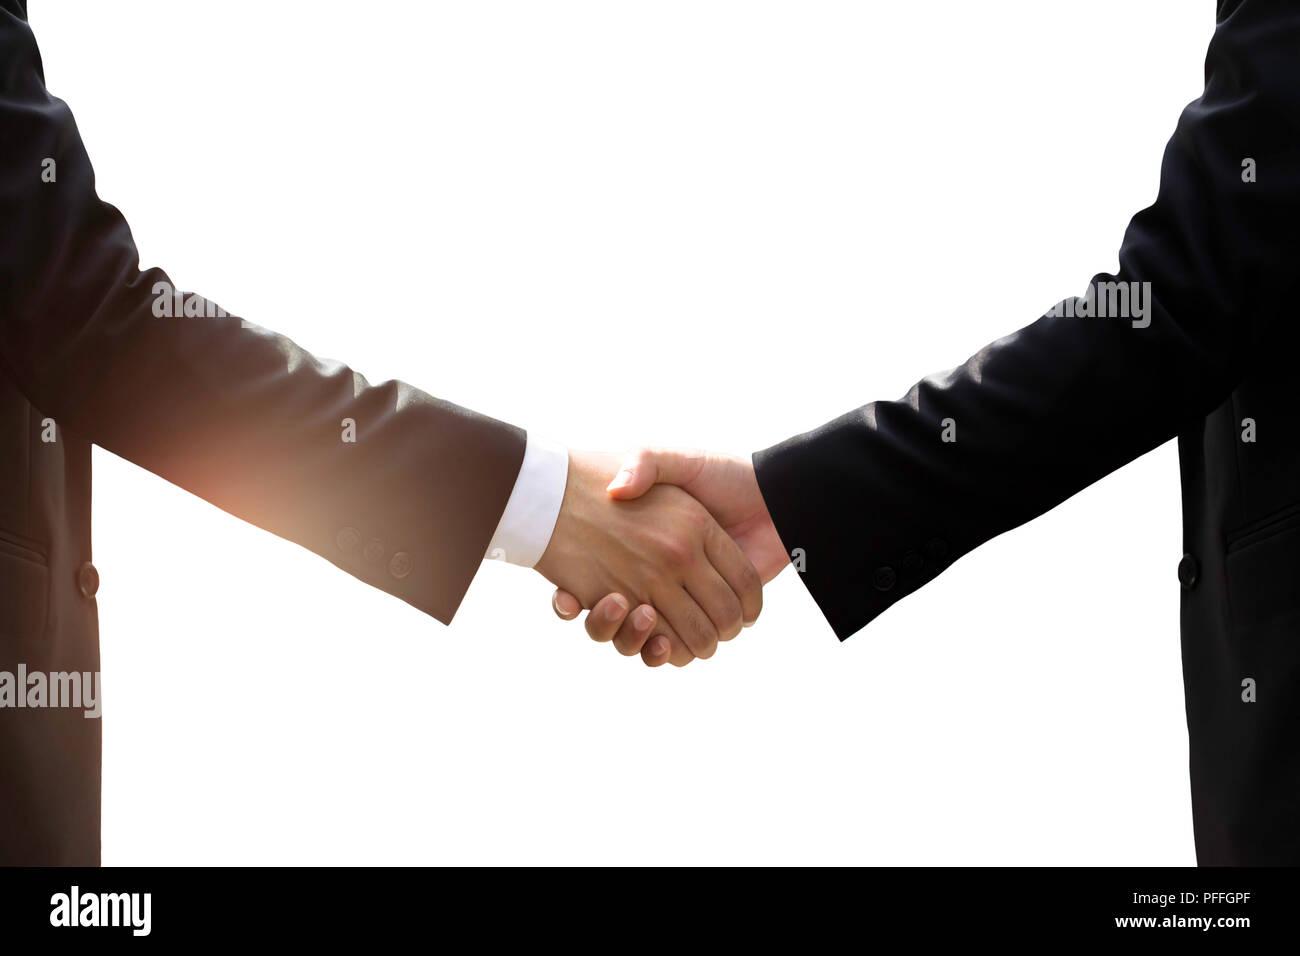 Business hand shake isolated  - Stock Image